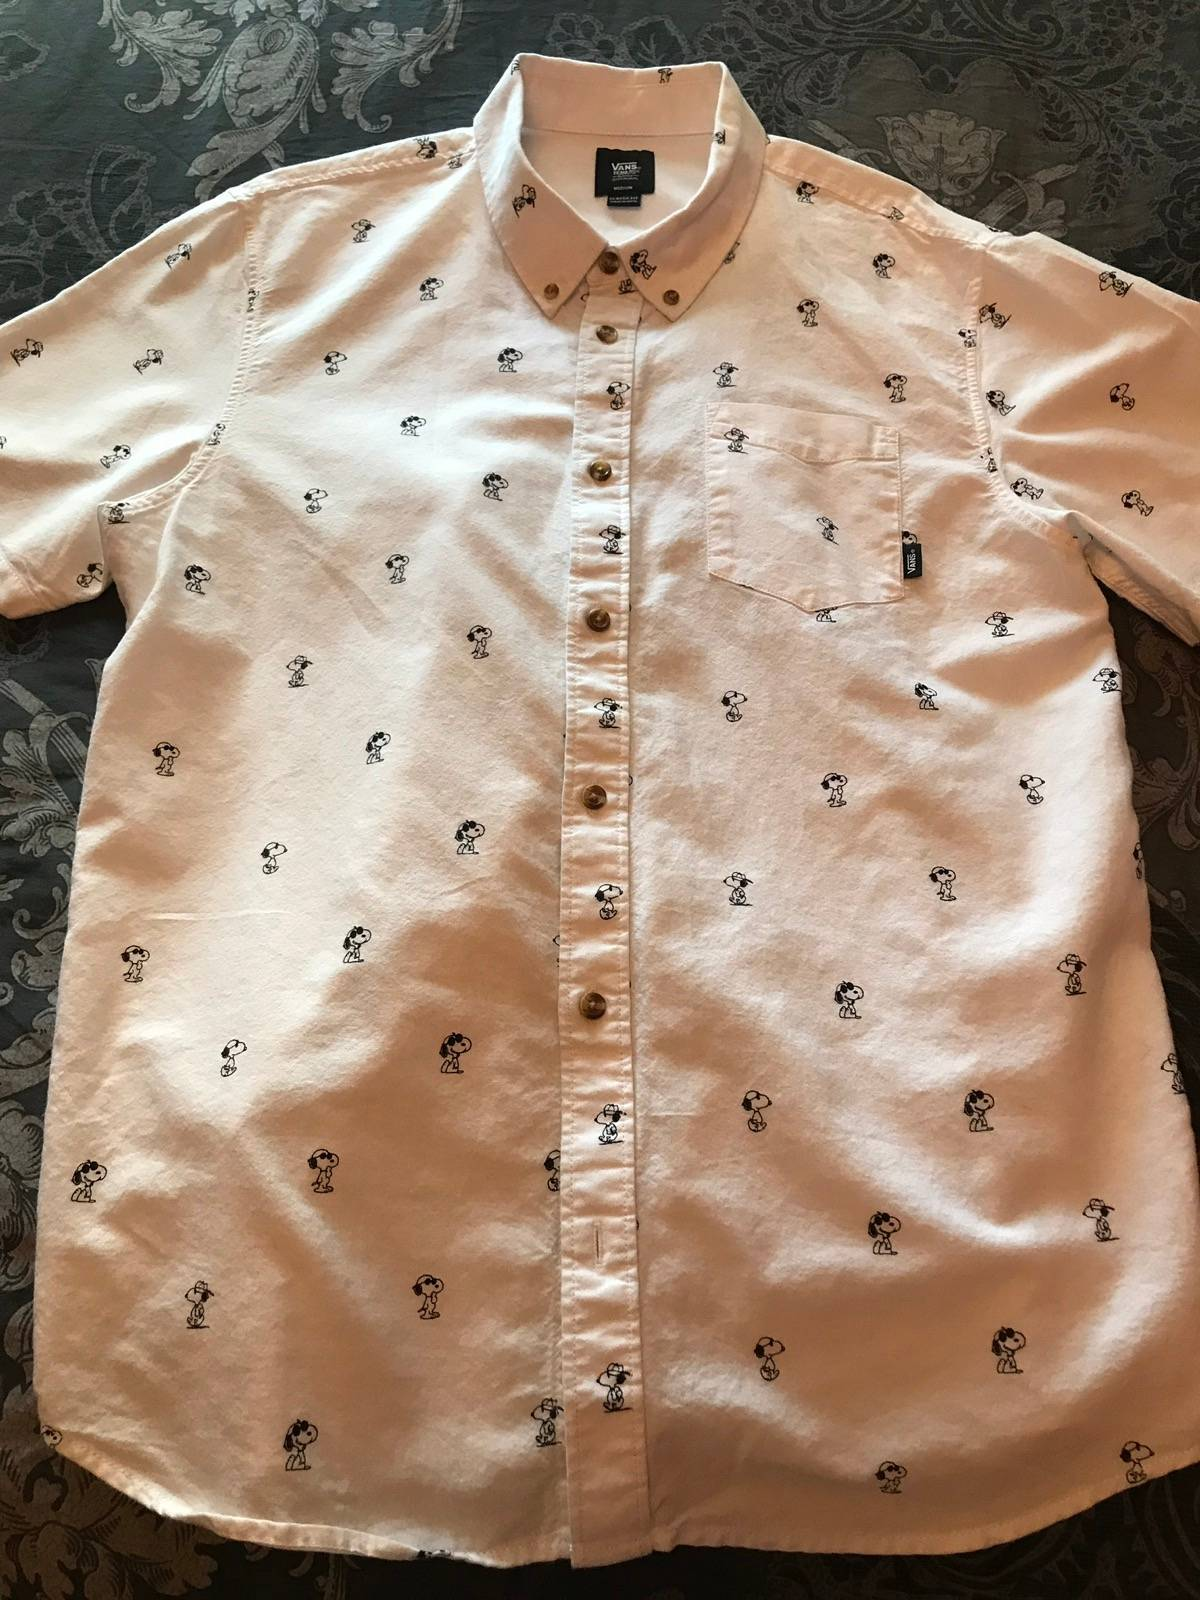 eeef45836 Vans × Peanuts ×. Snoopy Print Houser Short Sleeve Buttondown Shirt